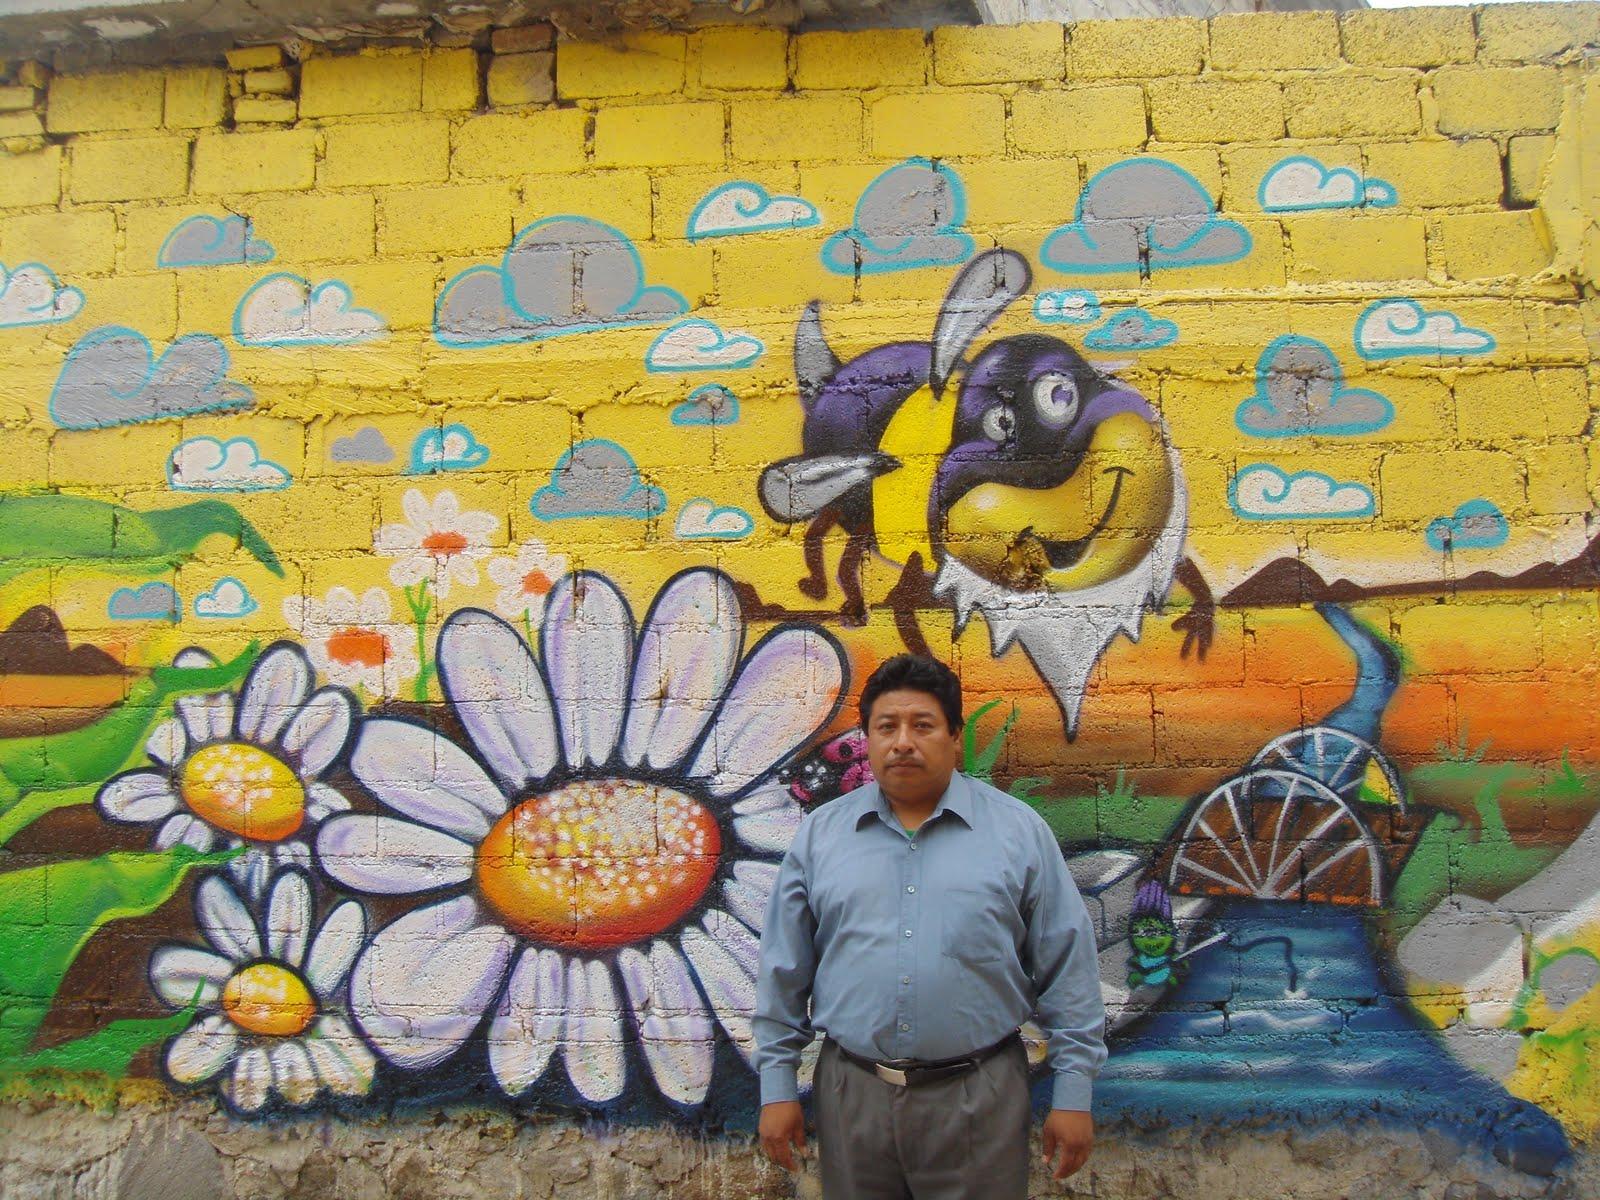 Colectivo arte express tico mural echo al kinder de for Arte colectivo mural